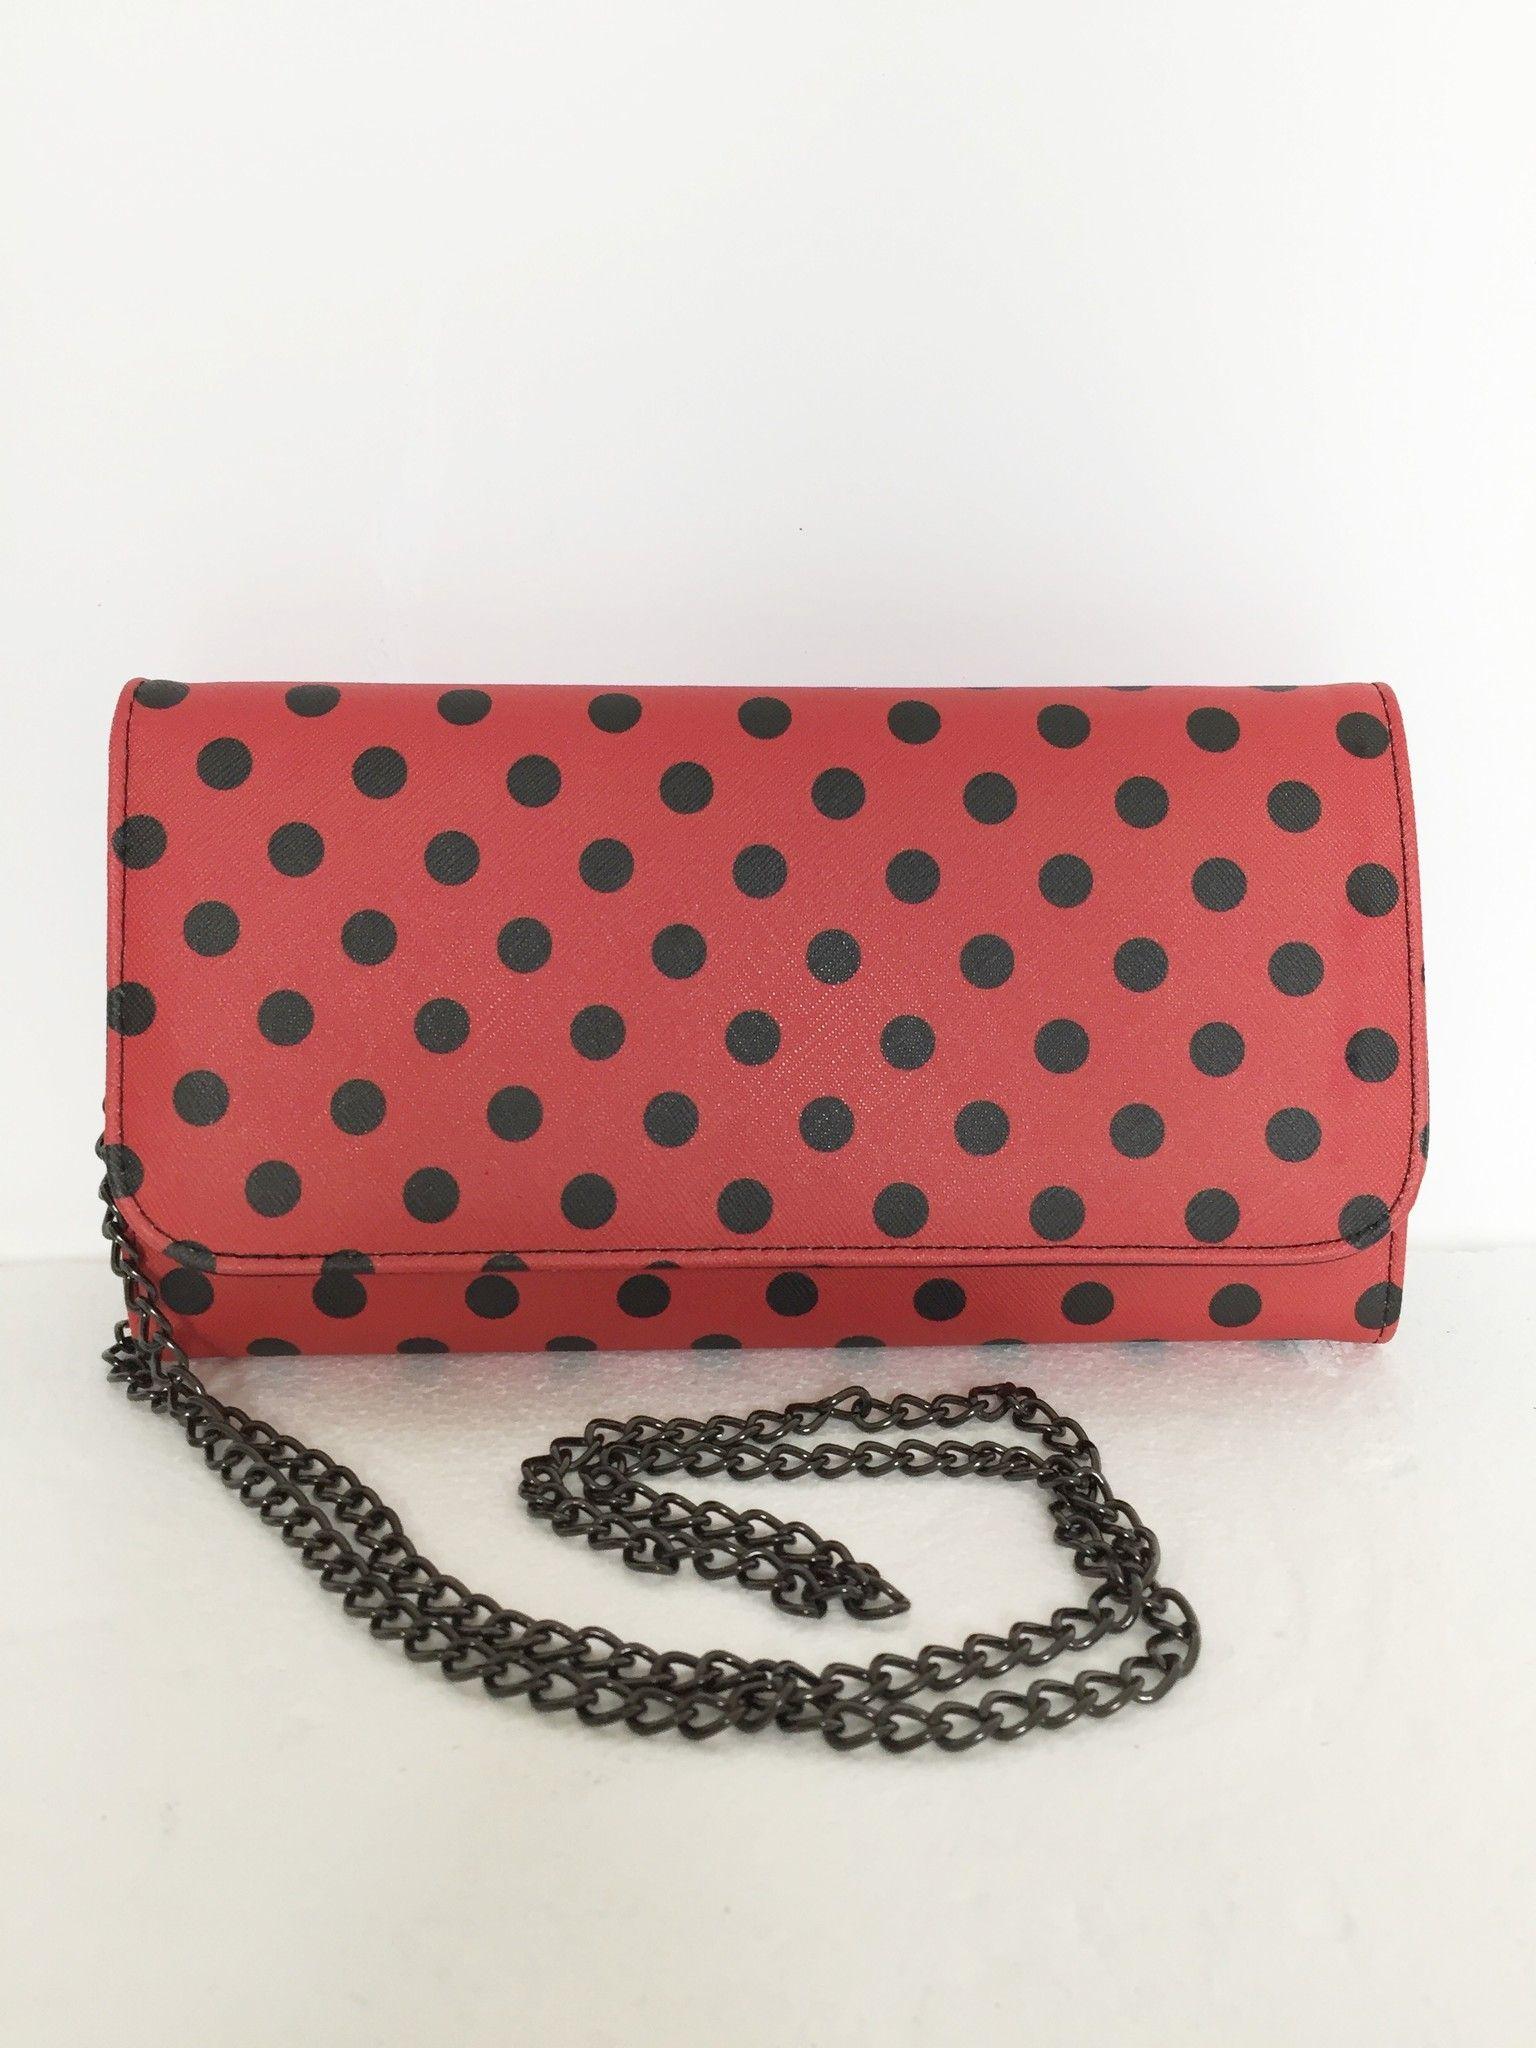 LadyBug clutch bag with metallic strap Cod.5624